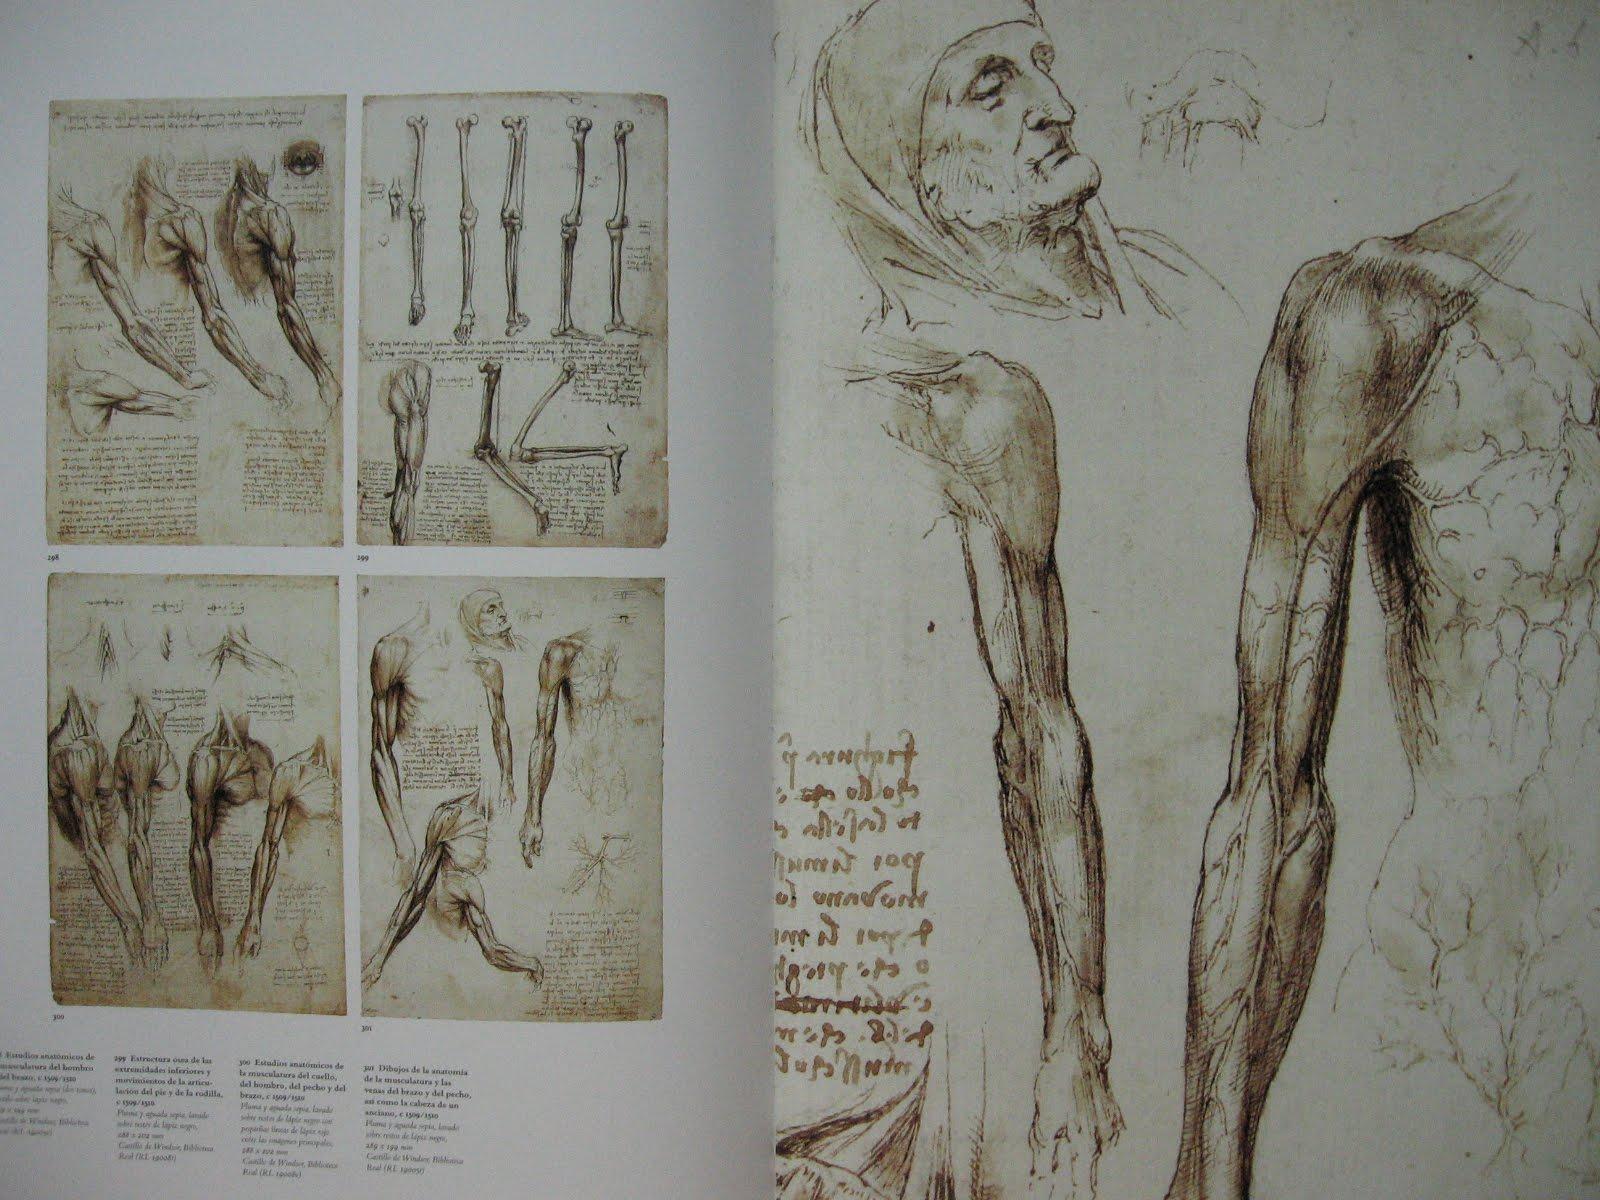 super-arte-diario: LEONARDO DA VINCI: ANATOMIST